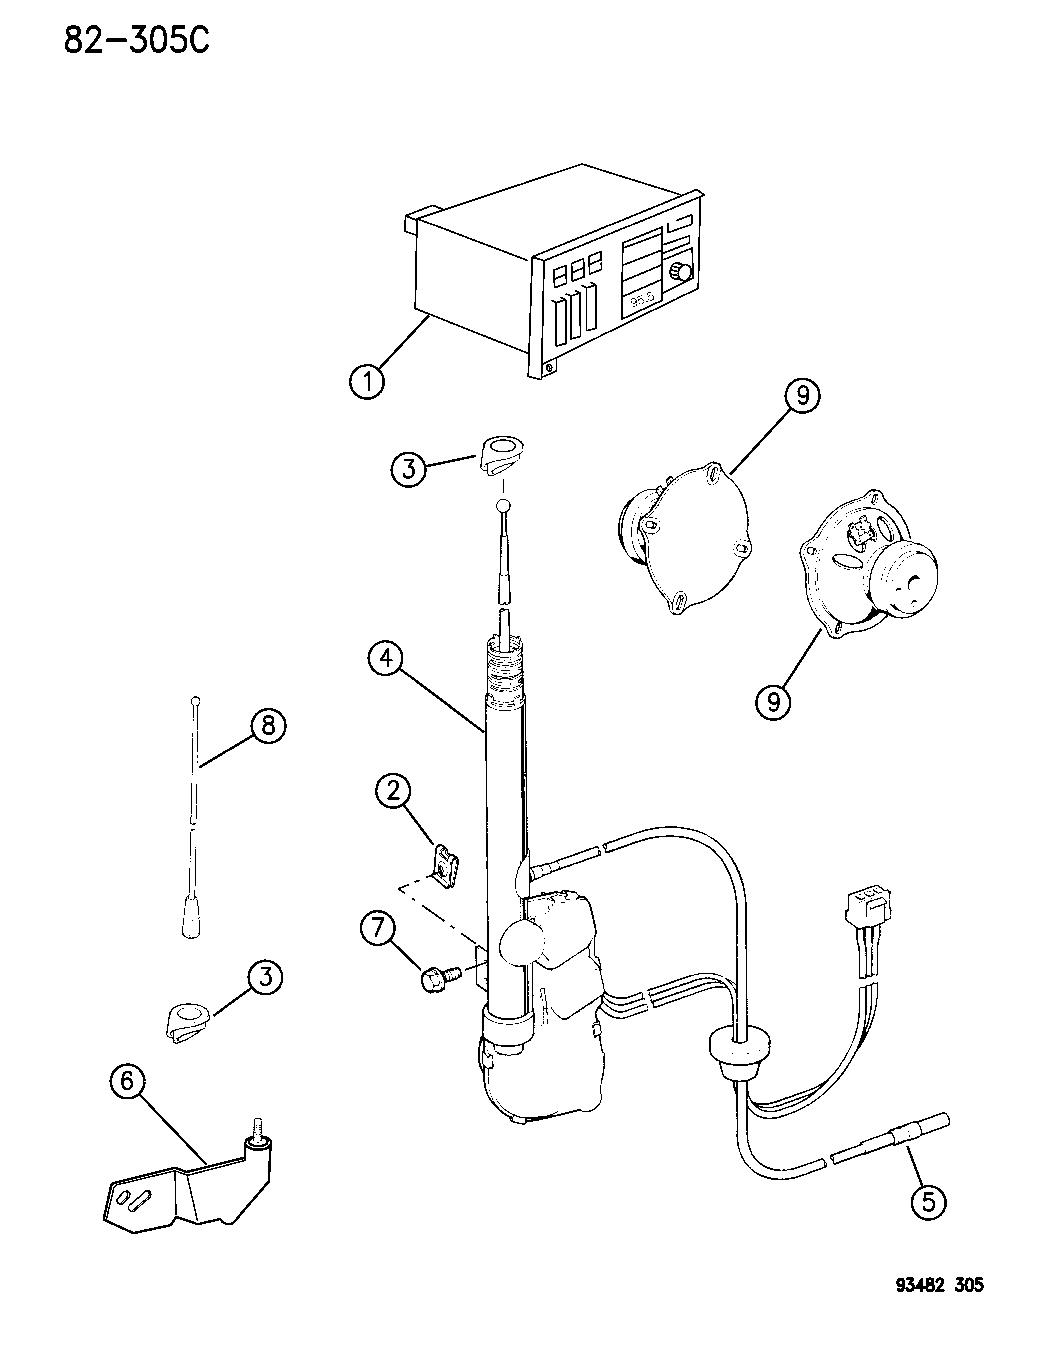 1996 Chrysler Concorde Radio, Antenna And Speakers